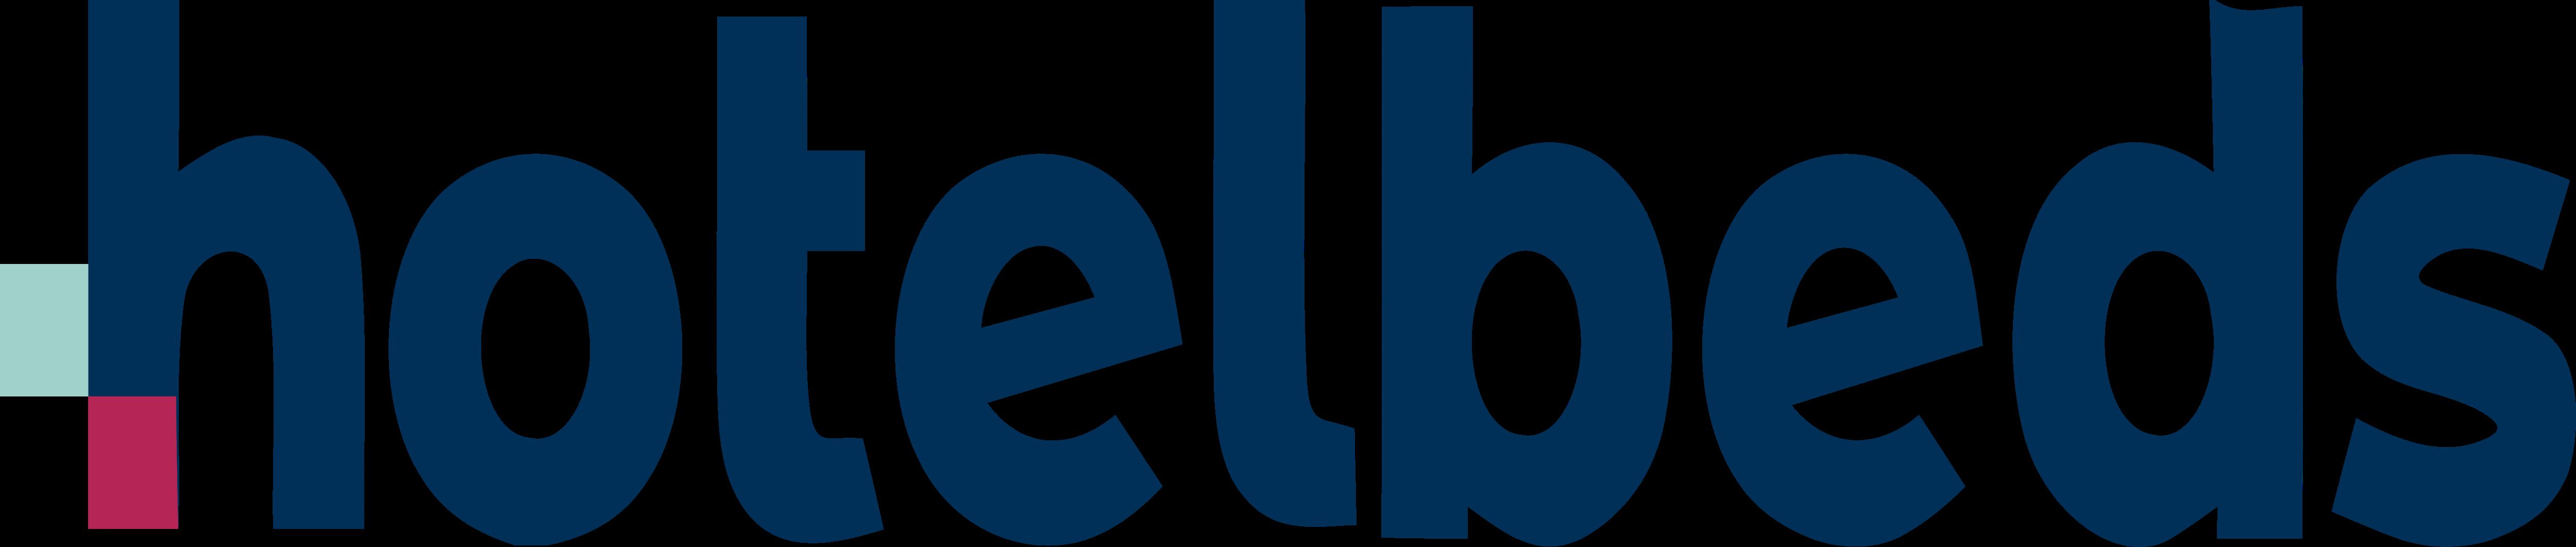 hotel beds logo